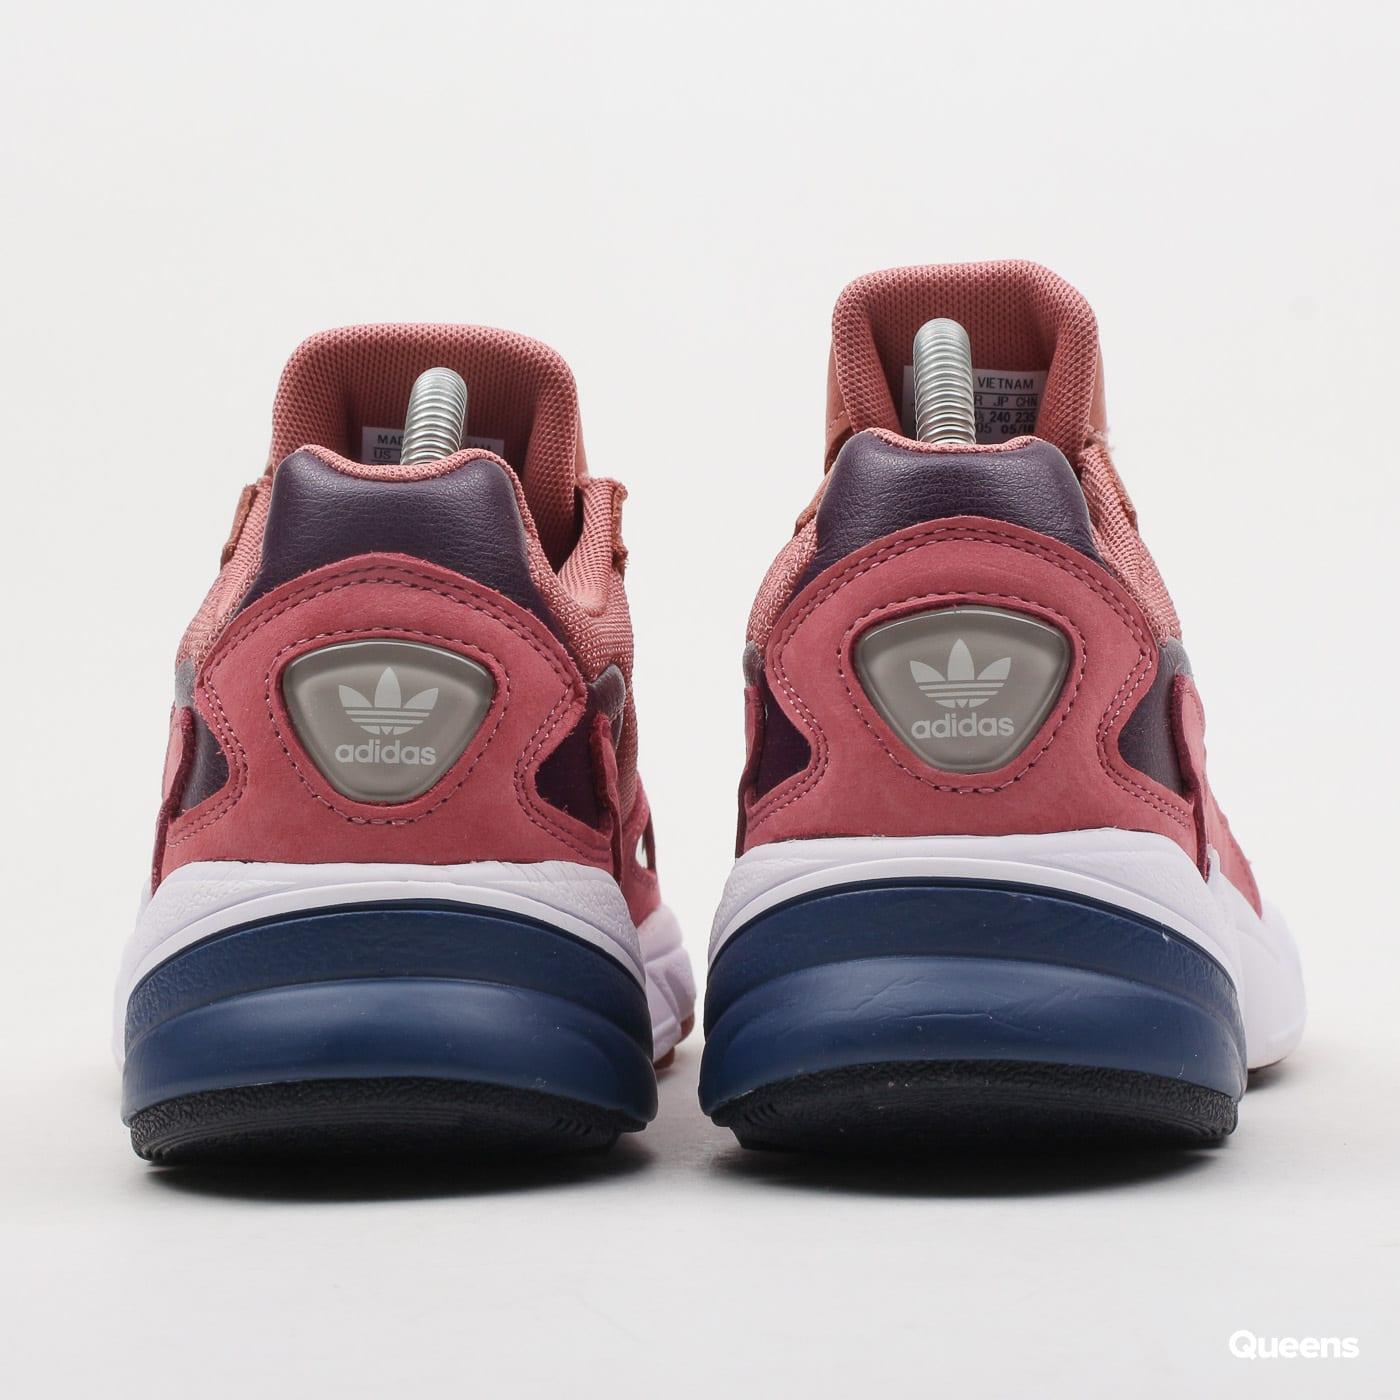 adidas Originals Falcon W rawpin / rawpin / dkblue